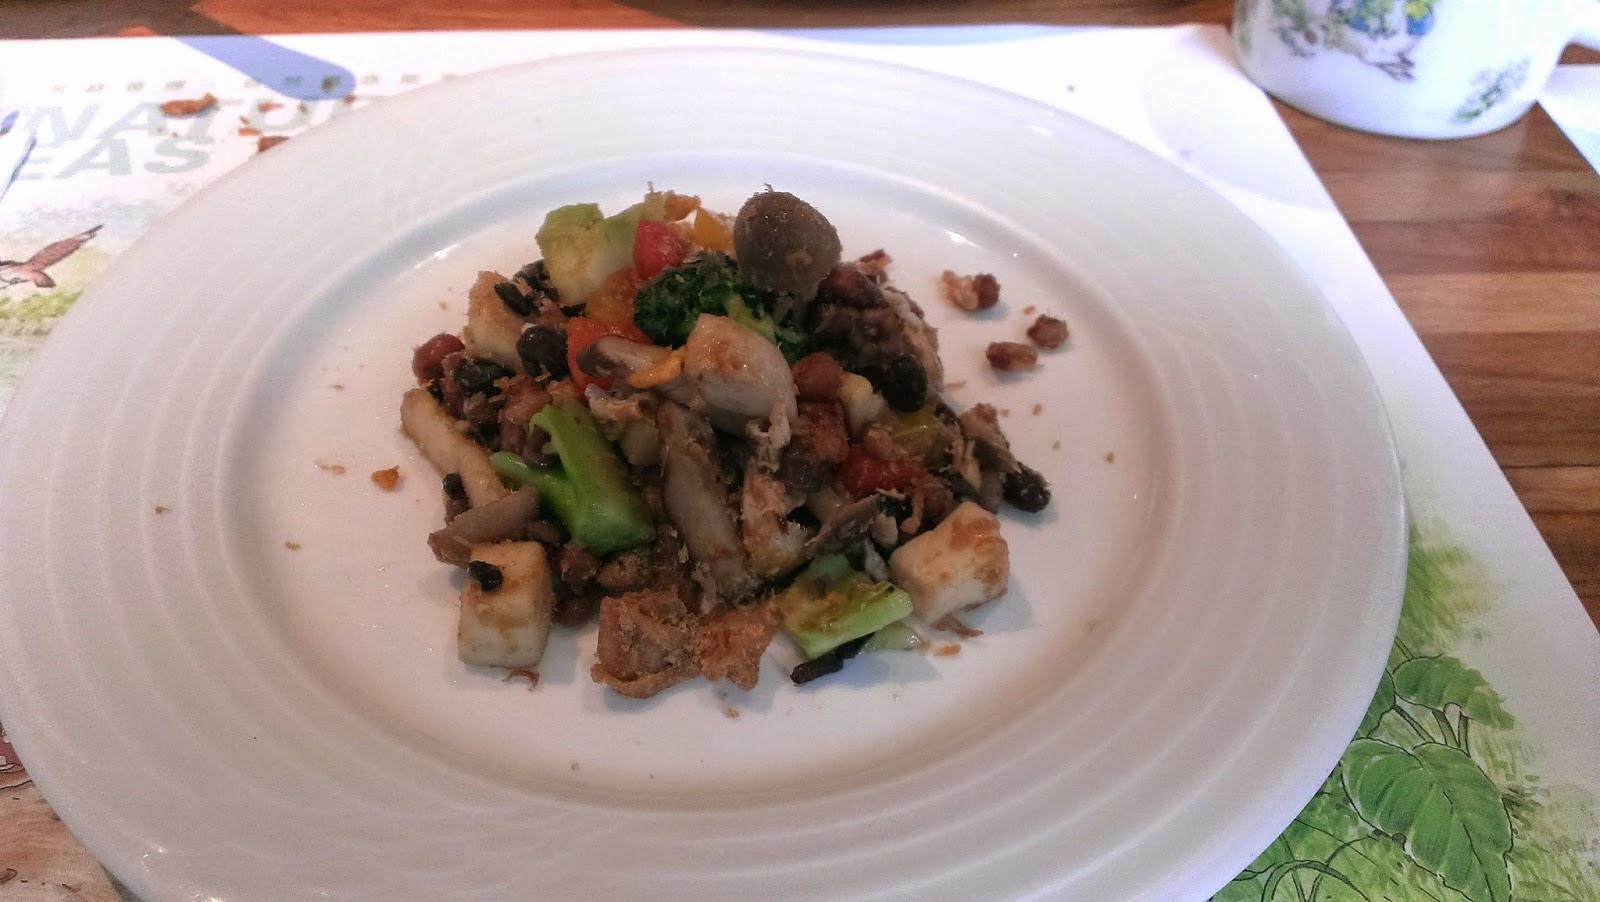 2014 09 08%2B12.59.08 - [食記] 芳庭彼得 - 義式創意無菜單料理,適合溫馨的小聚